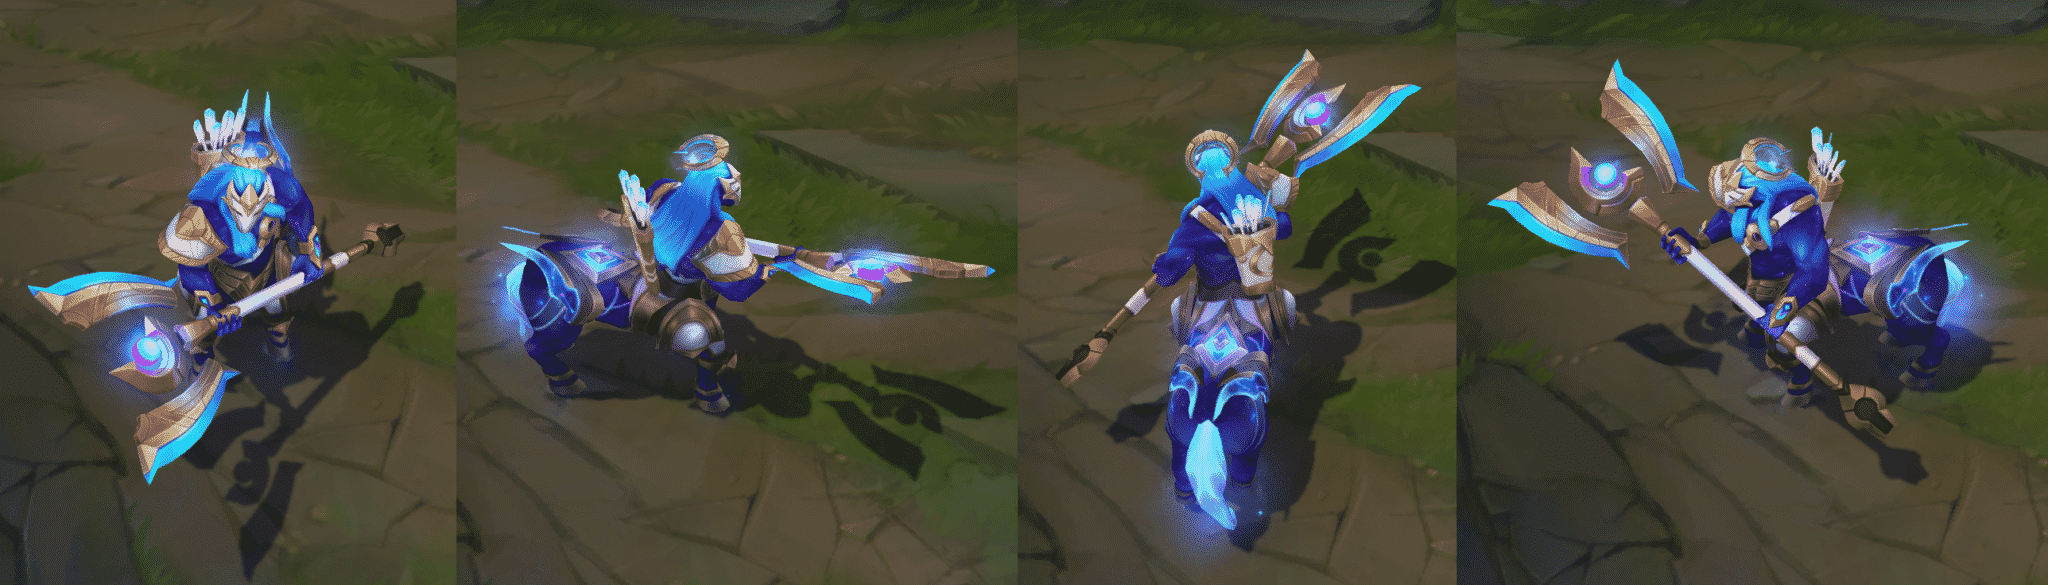 lol-skin-cosmic-charger-hecarim